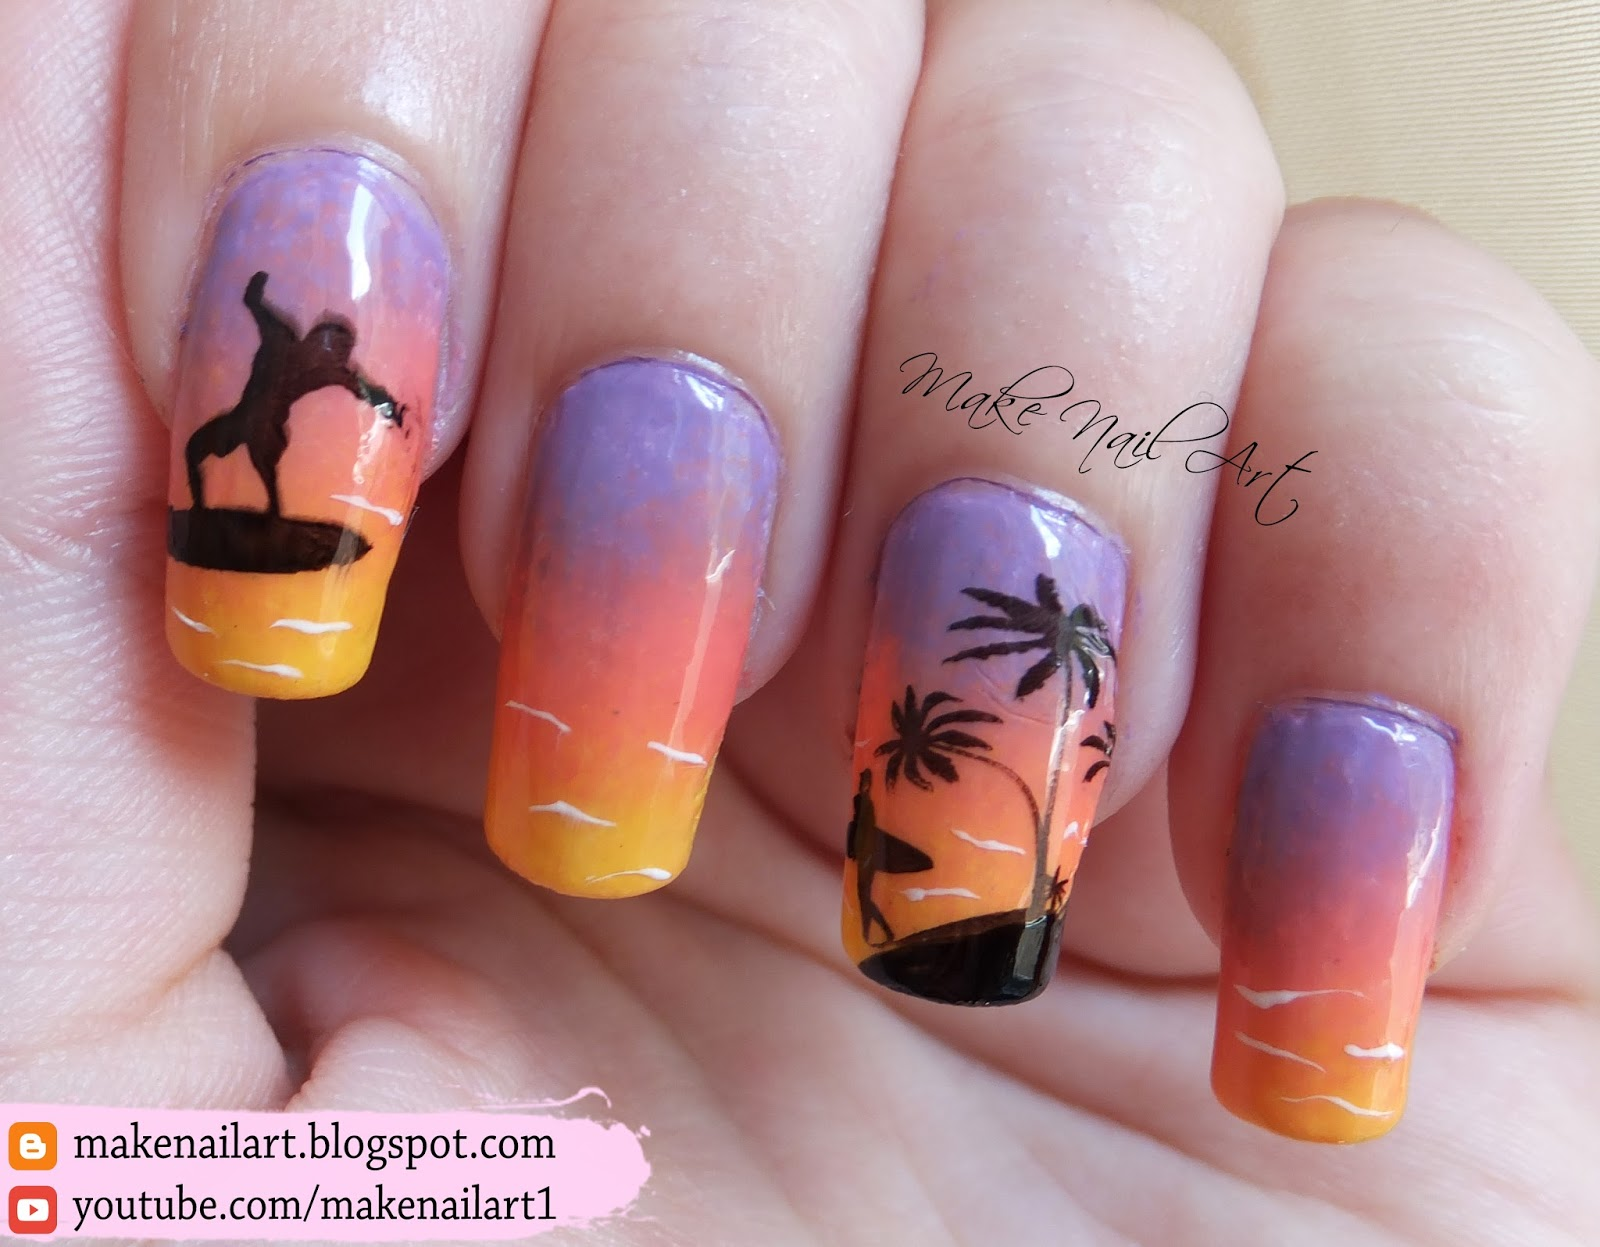 Make Nail Art: Summer Sea Sunset Stamping Nail Art Design ...